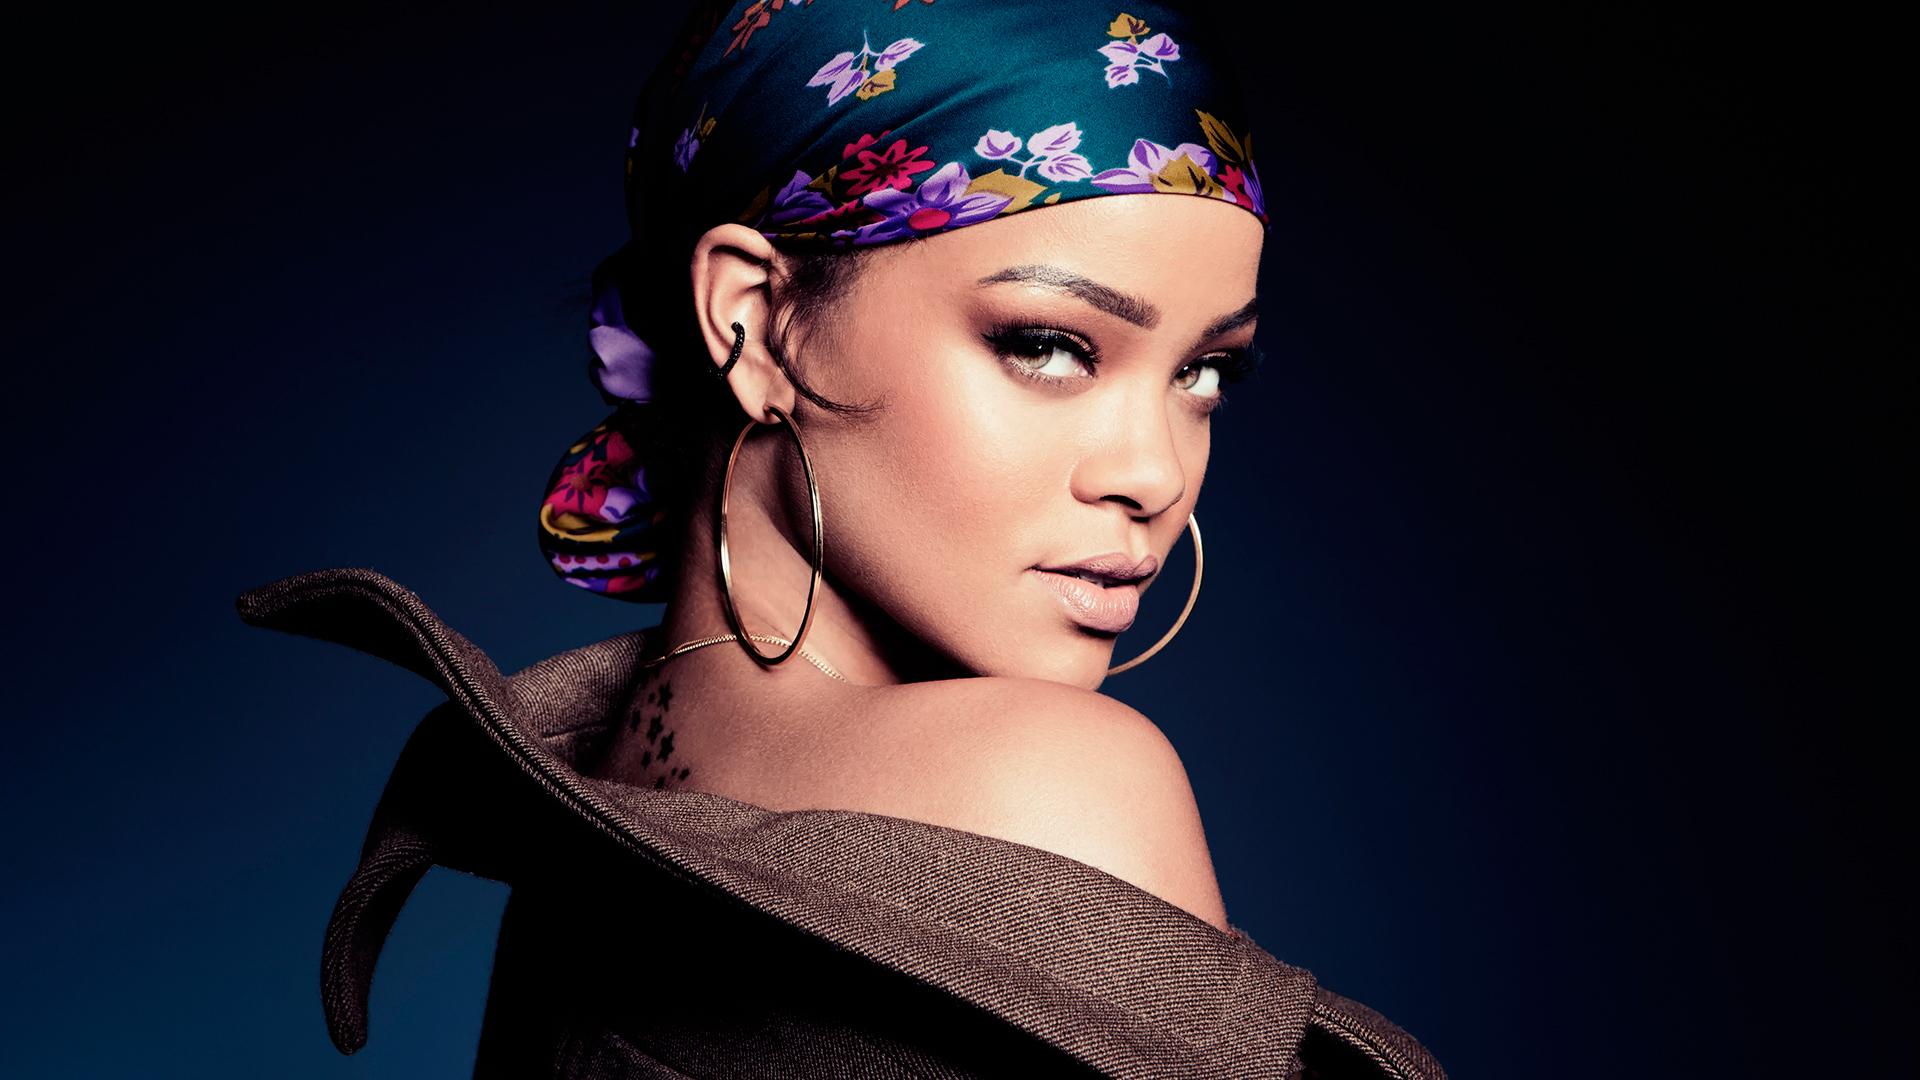 Rihanna 2015 Wallpapers HD Wallpapers 1920x1080